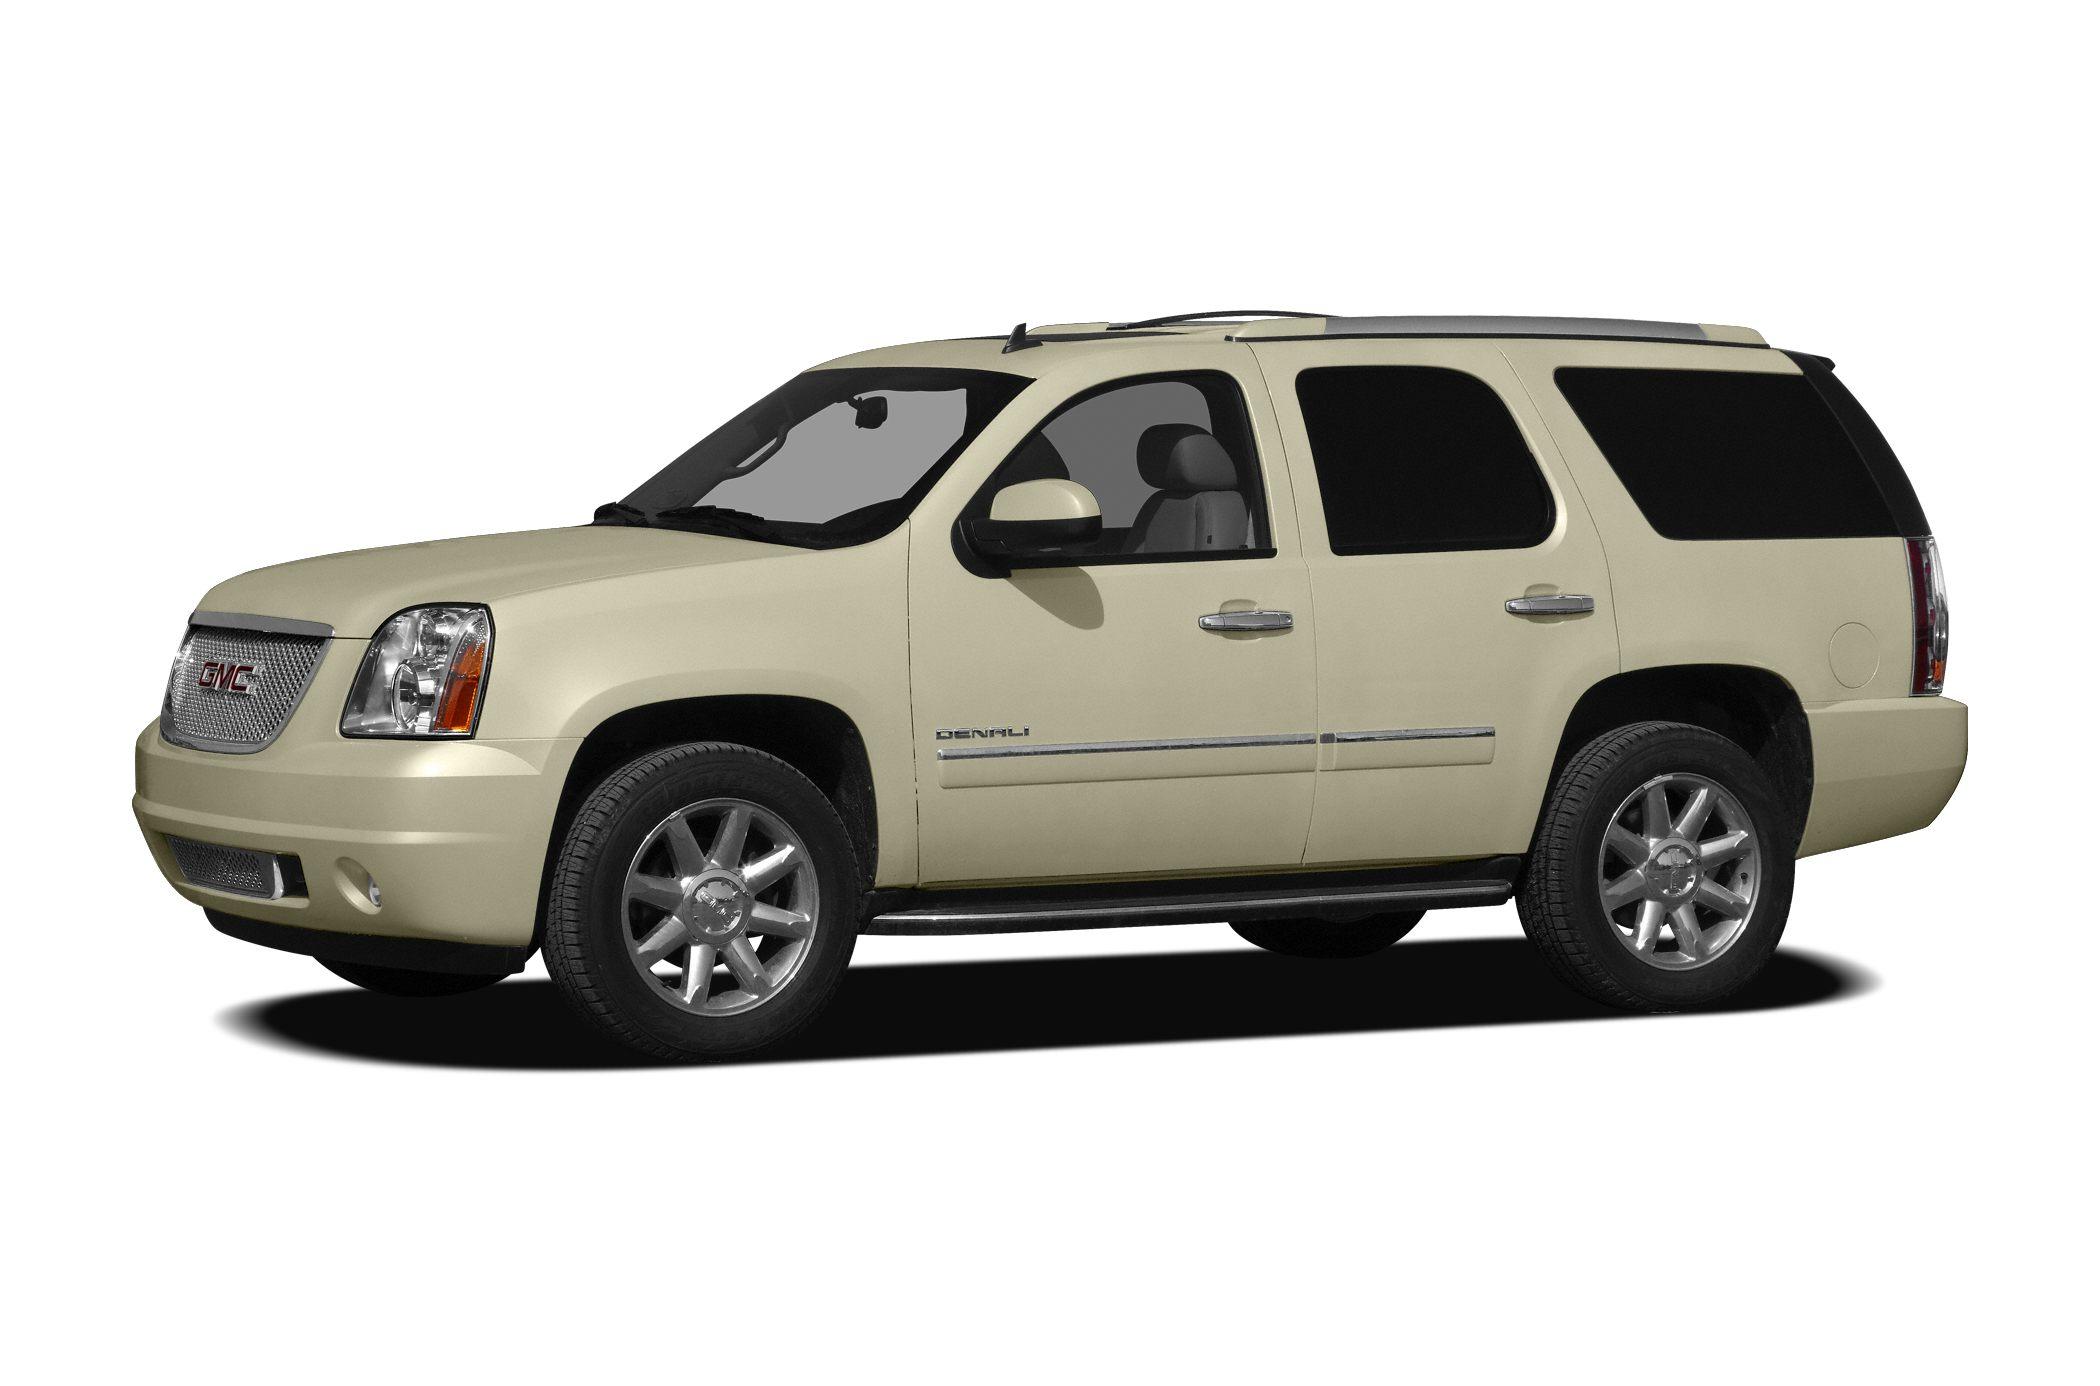 2010 GMC Yukon Denali Miles 141126Color Gray Stock AR202811 VIN 1GKUKEEF5AR202811